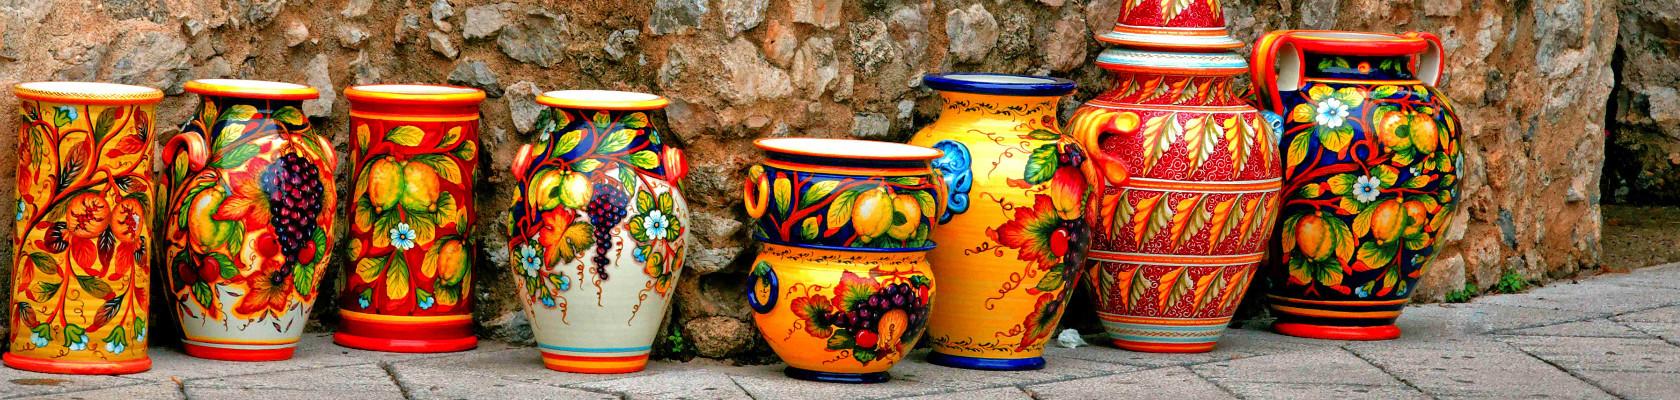 Sicilija-božanska keramika